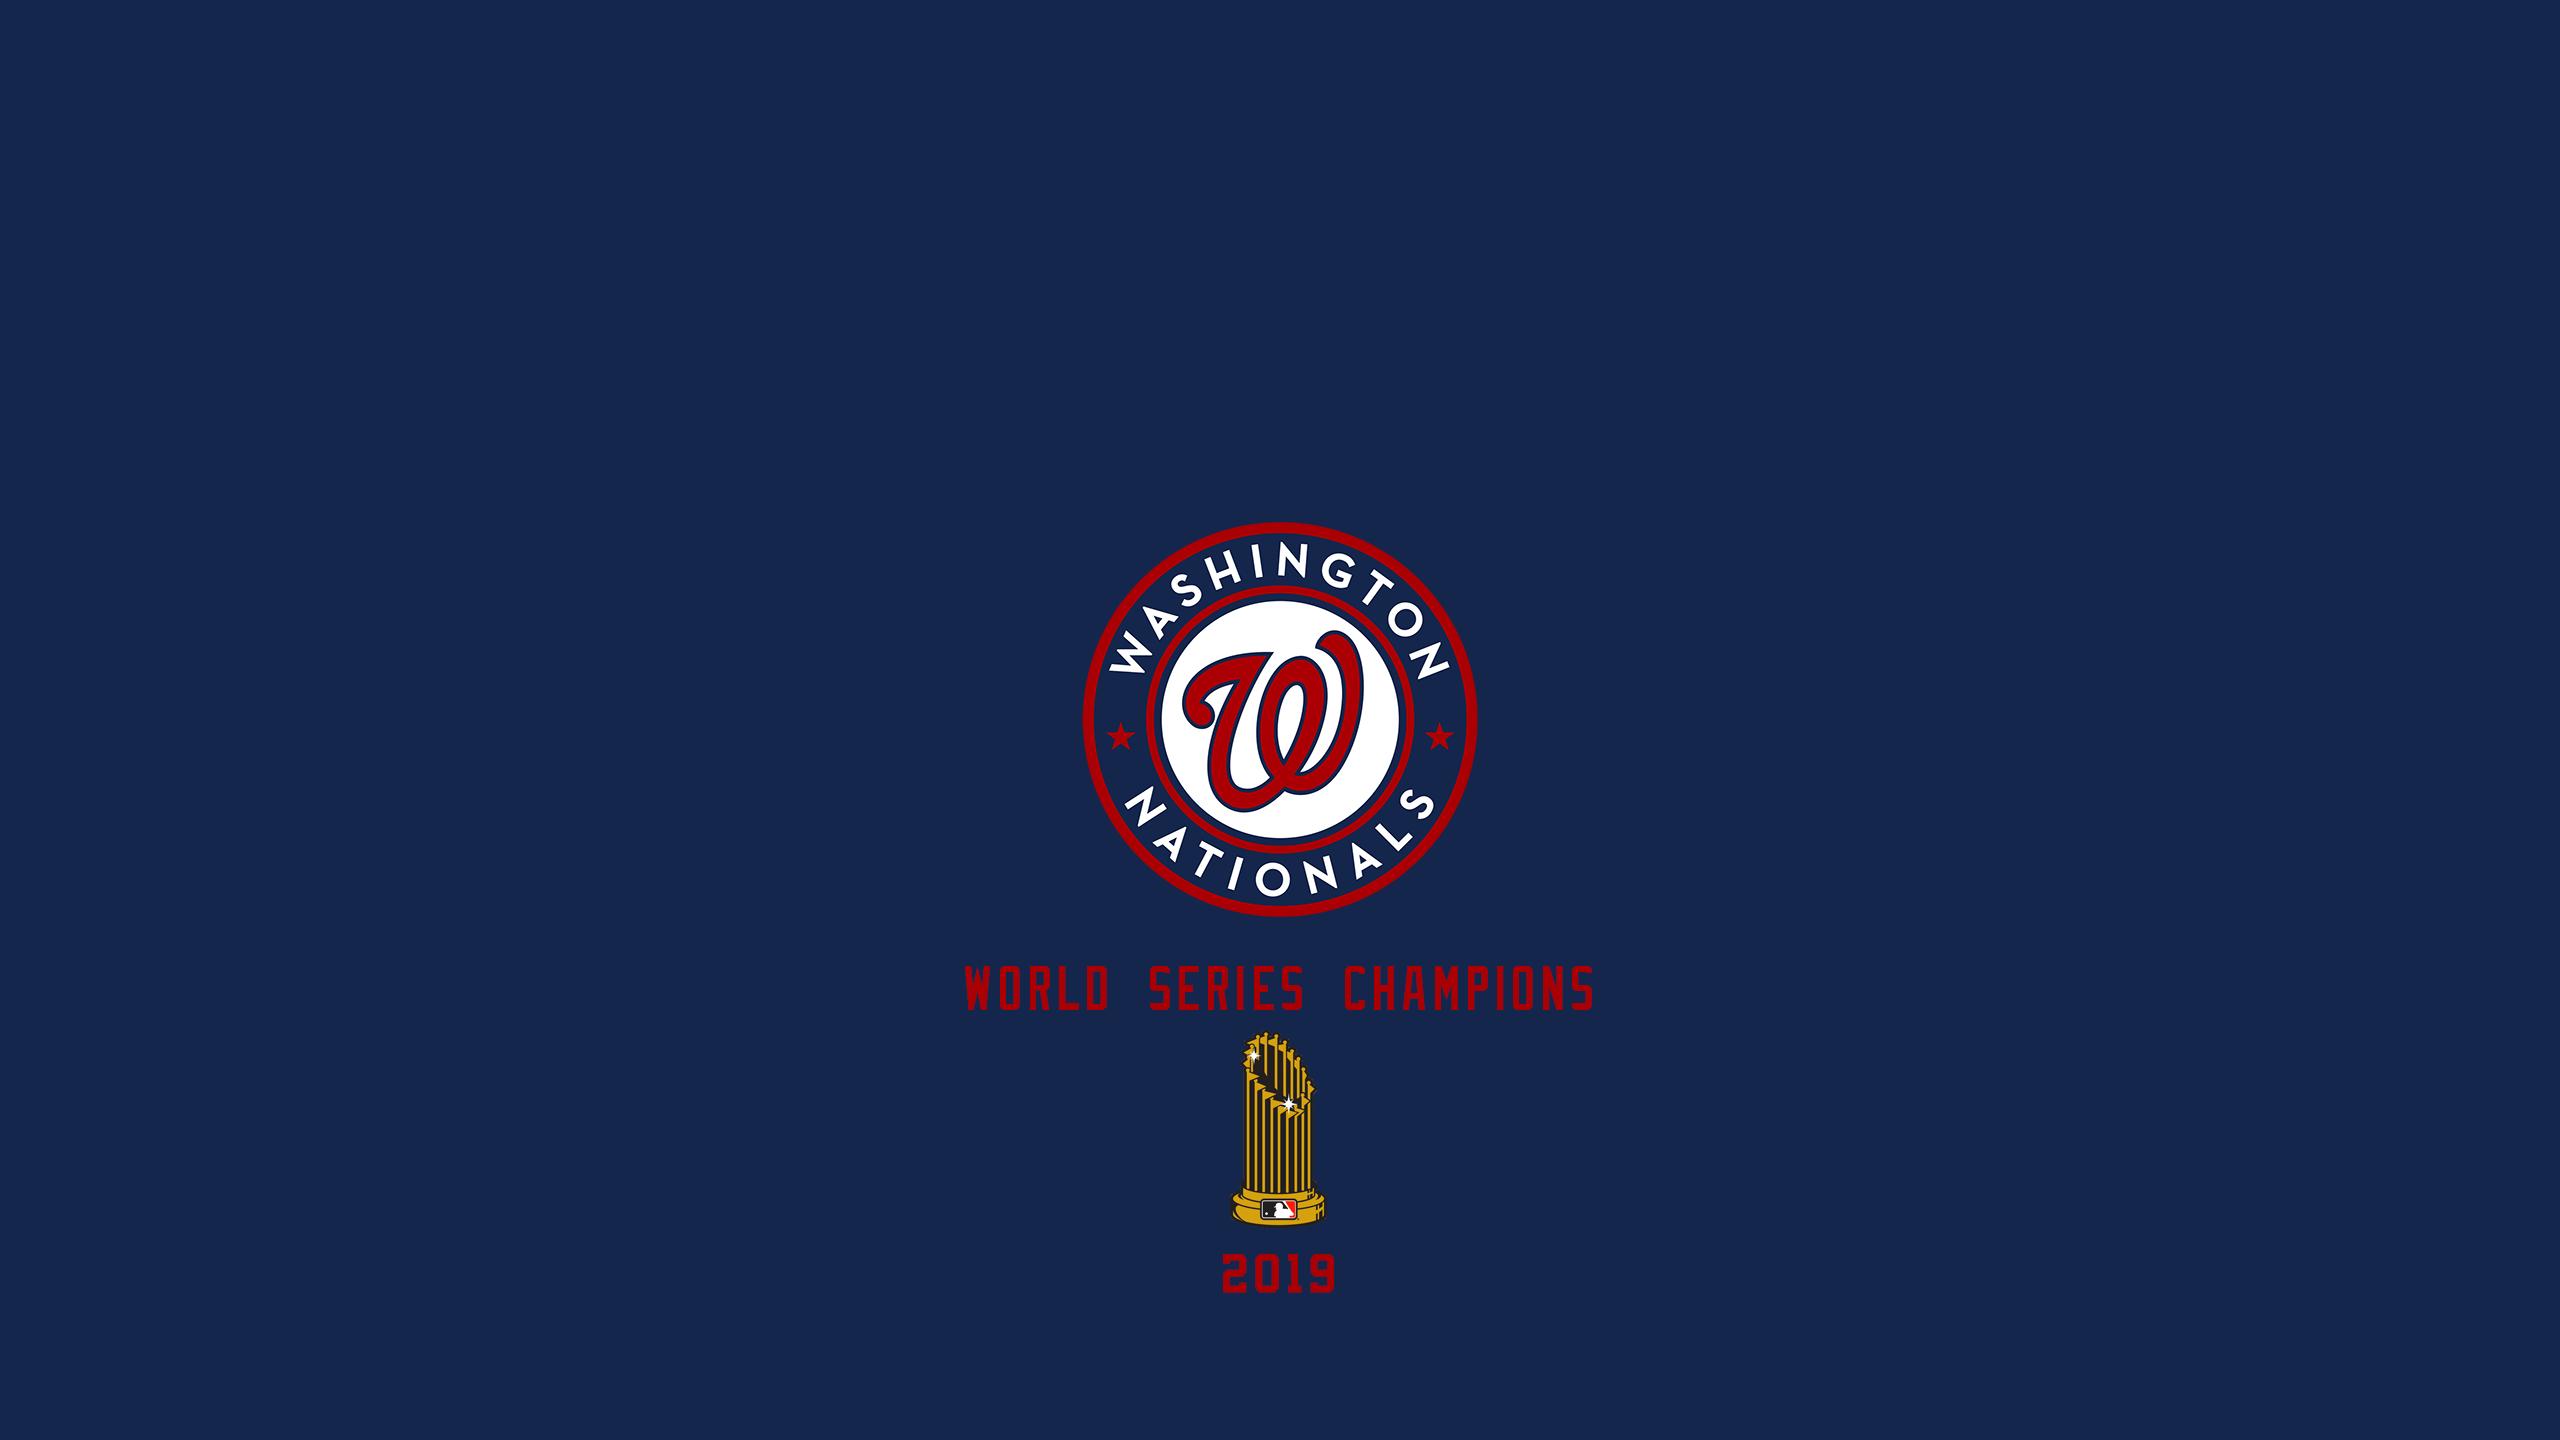 Washington Nationals - World Series Champs